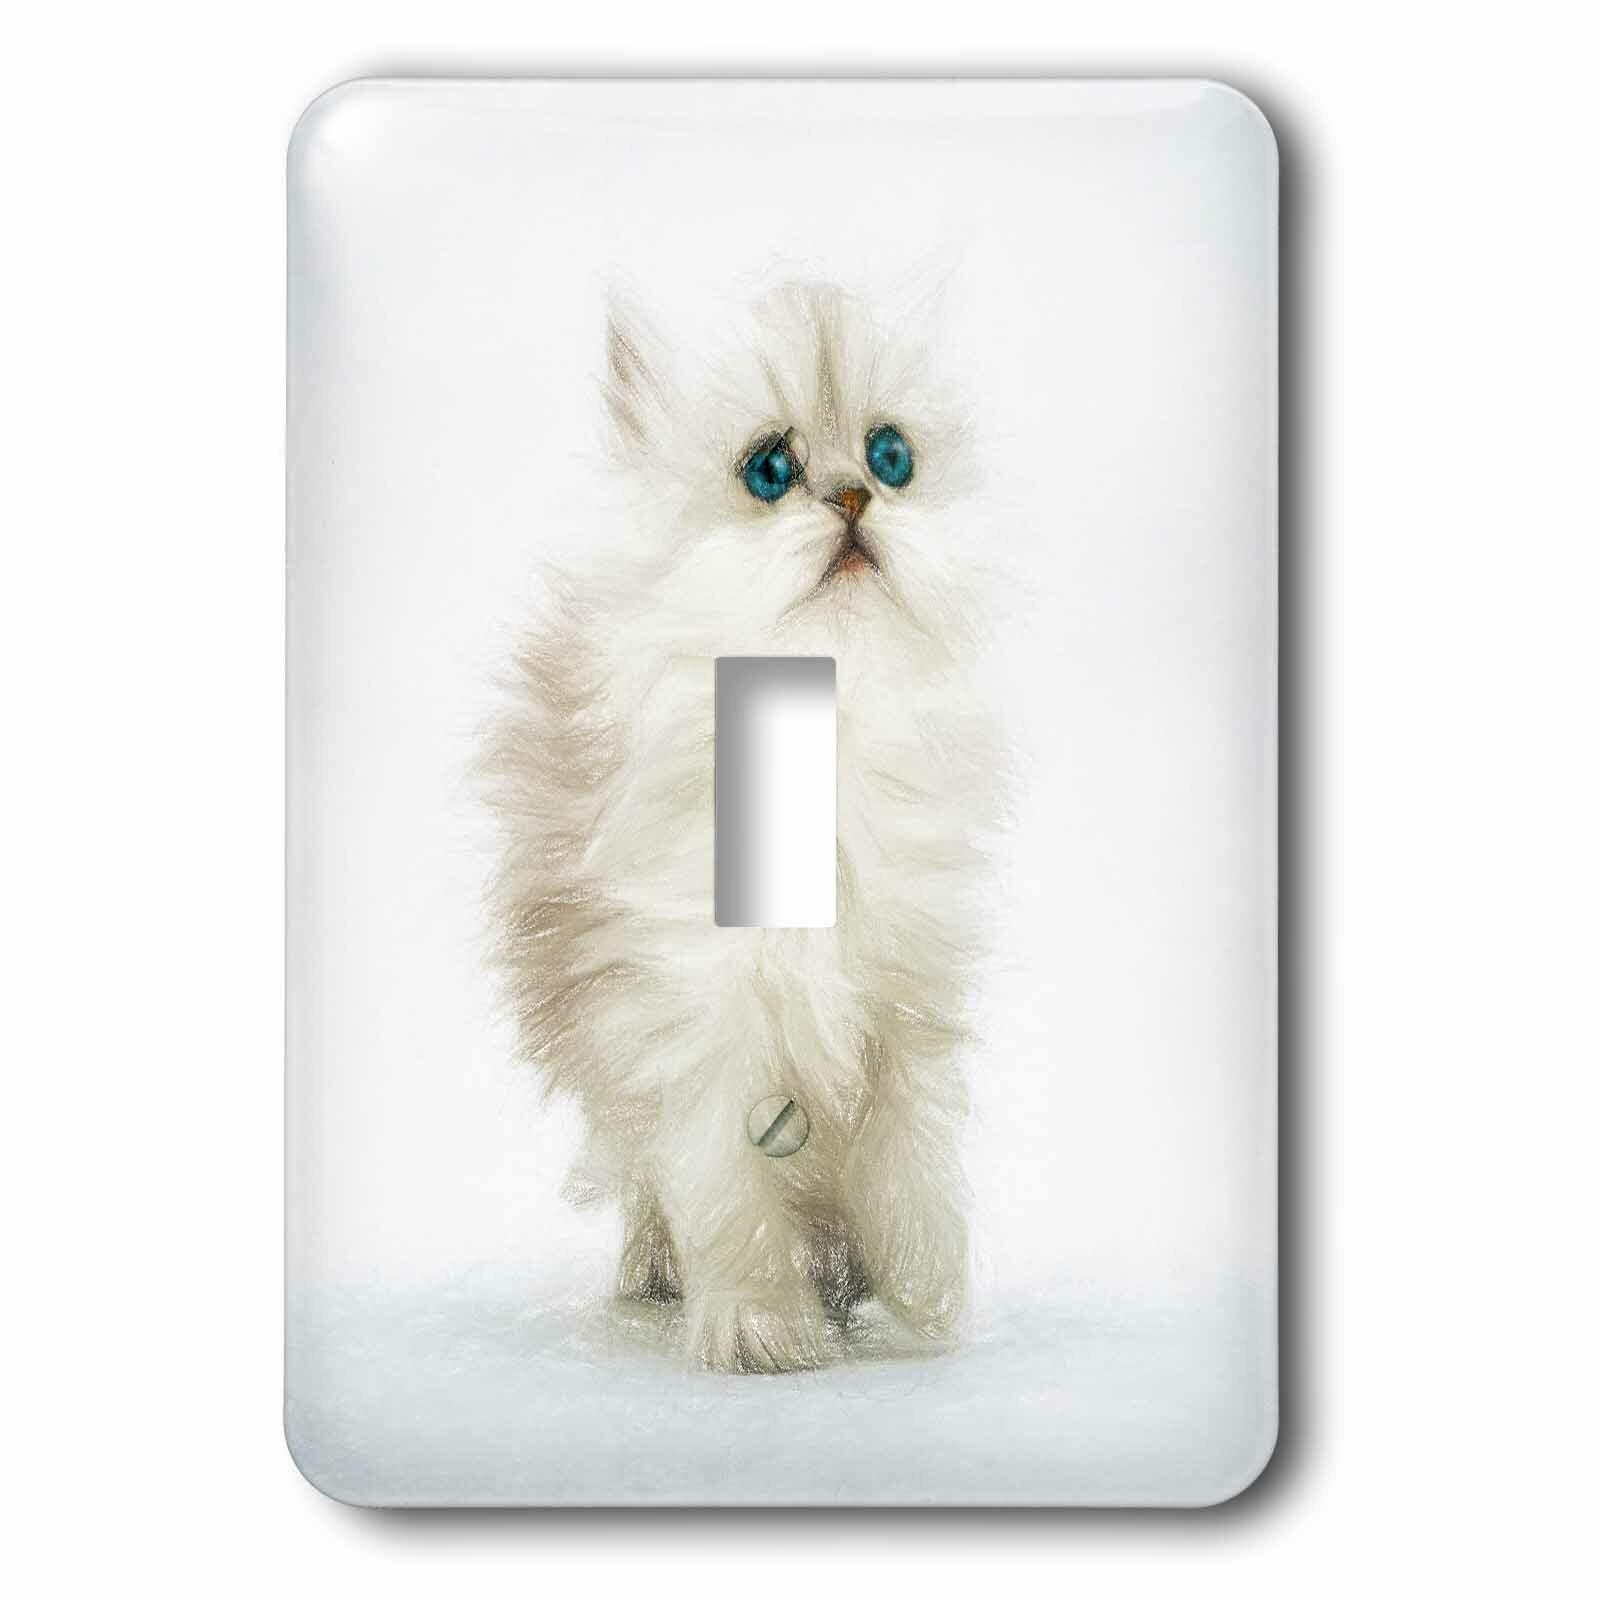 3drose Persian Kitten 1 Gang Toggle Light Switch Wall Plate Wayfair